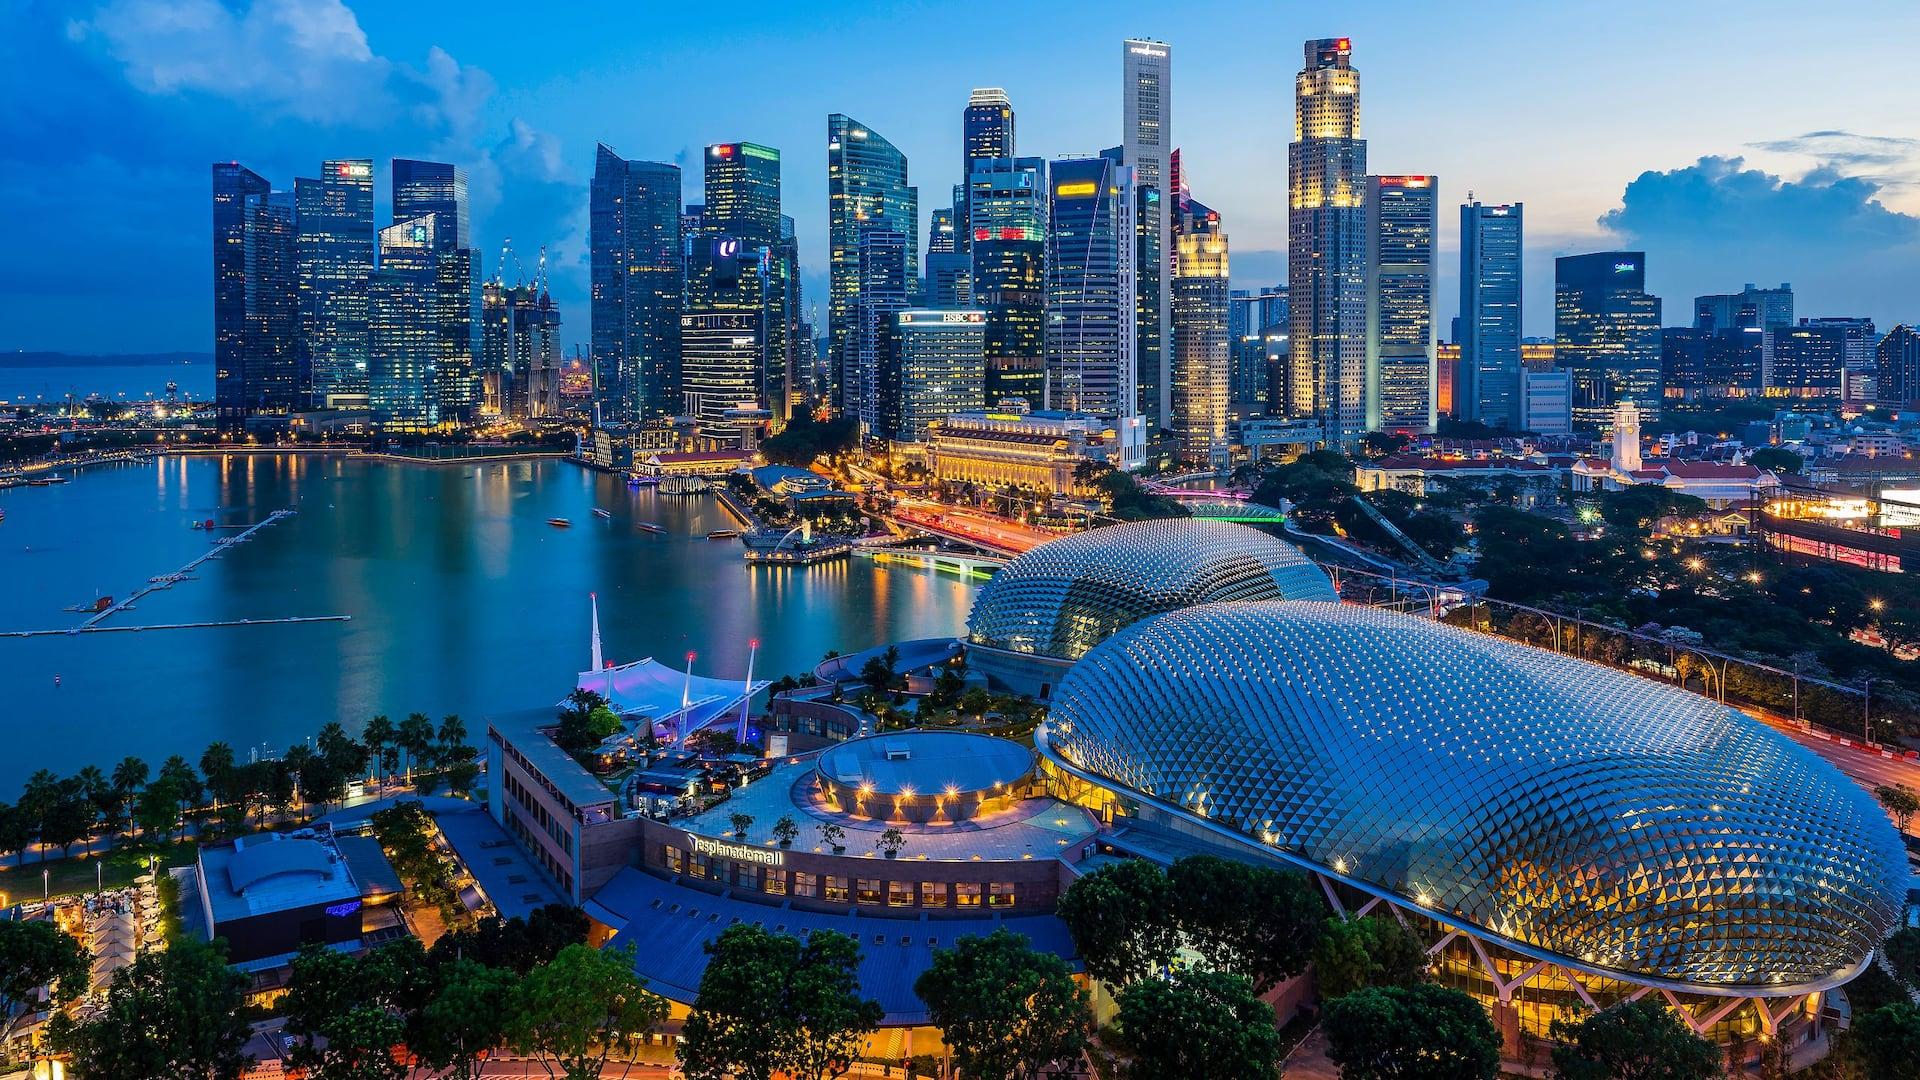 Grand Hyatt Singapore Esplanade